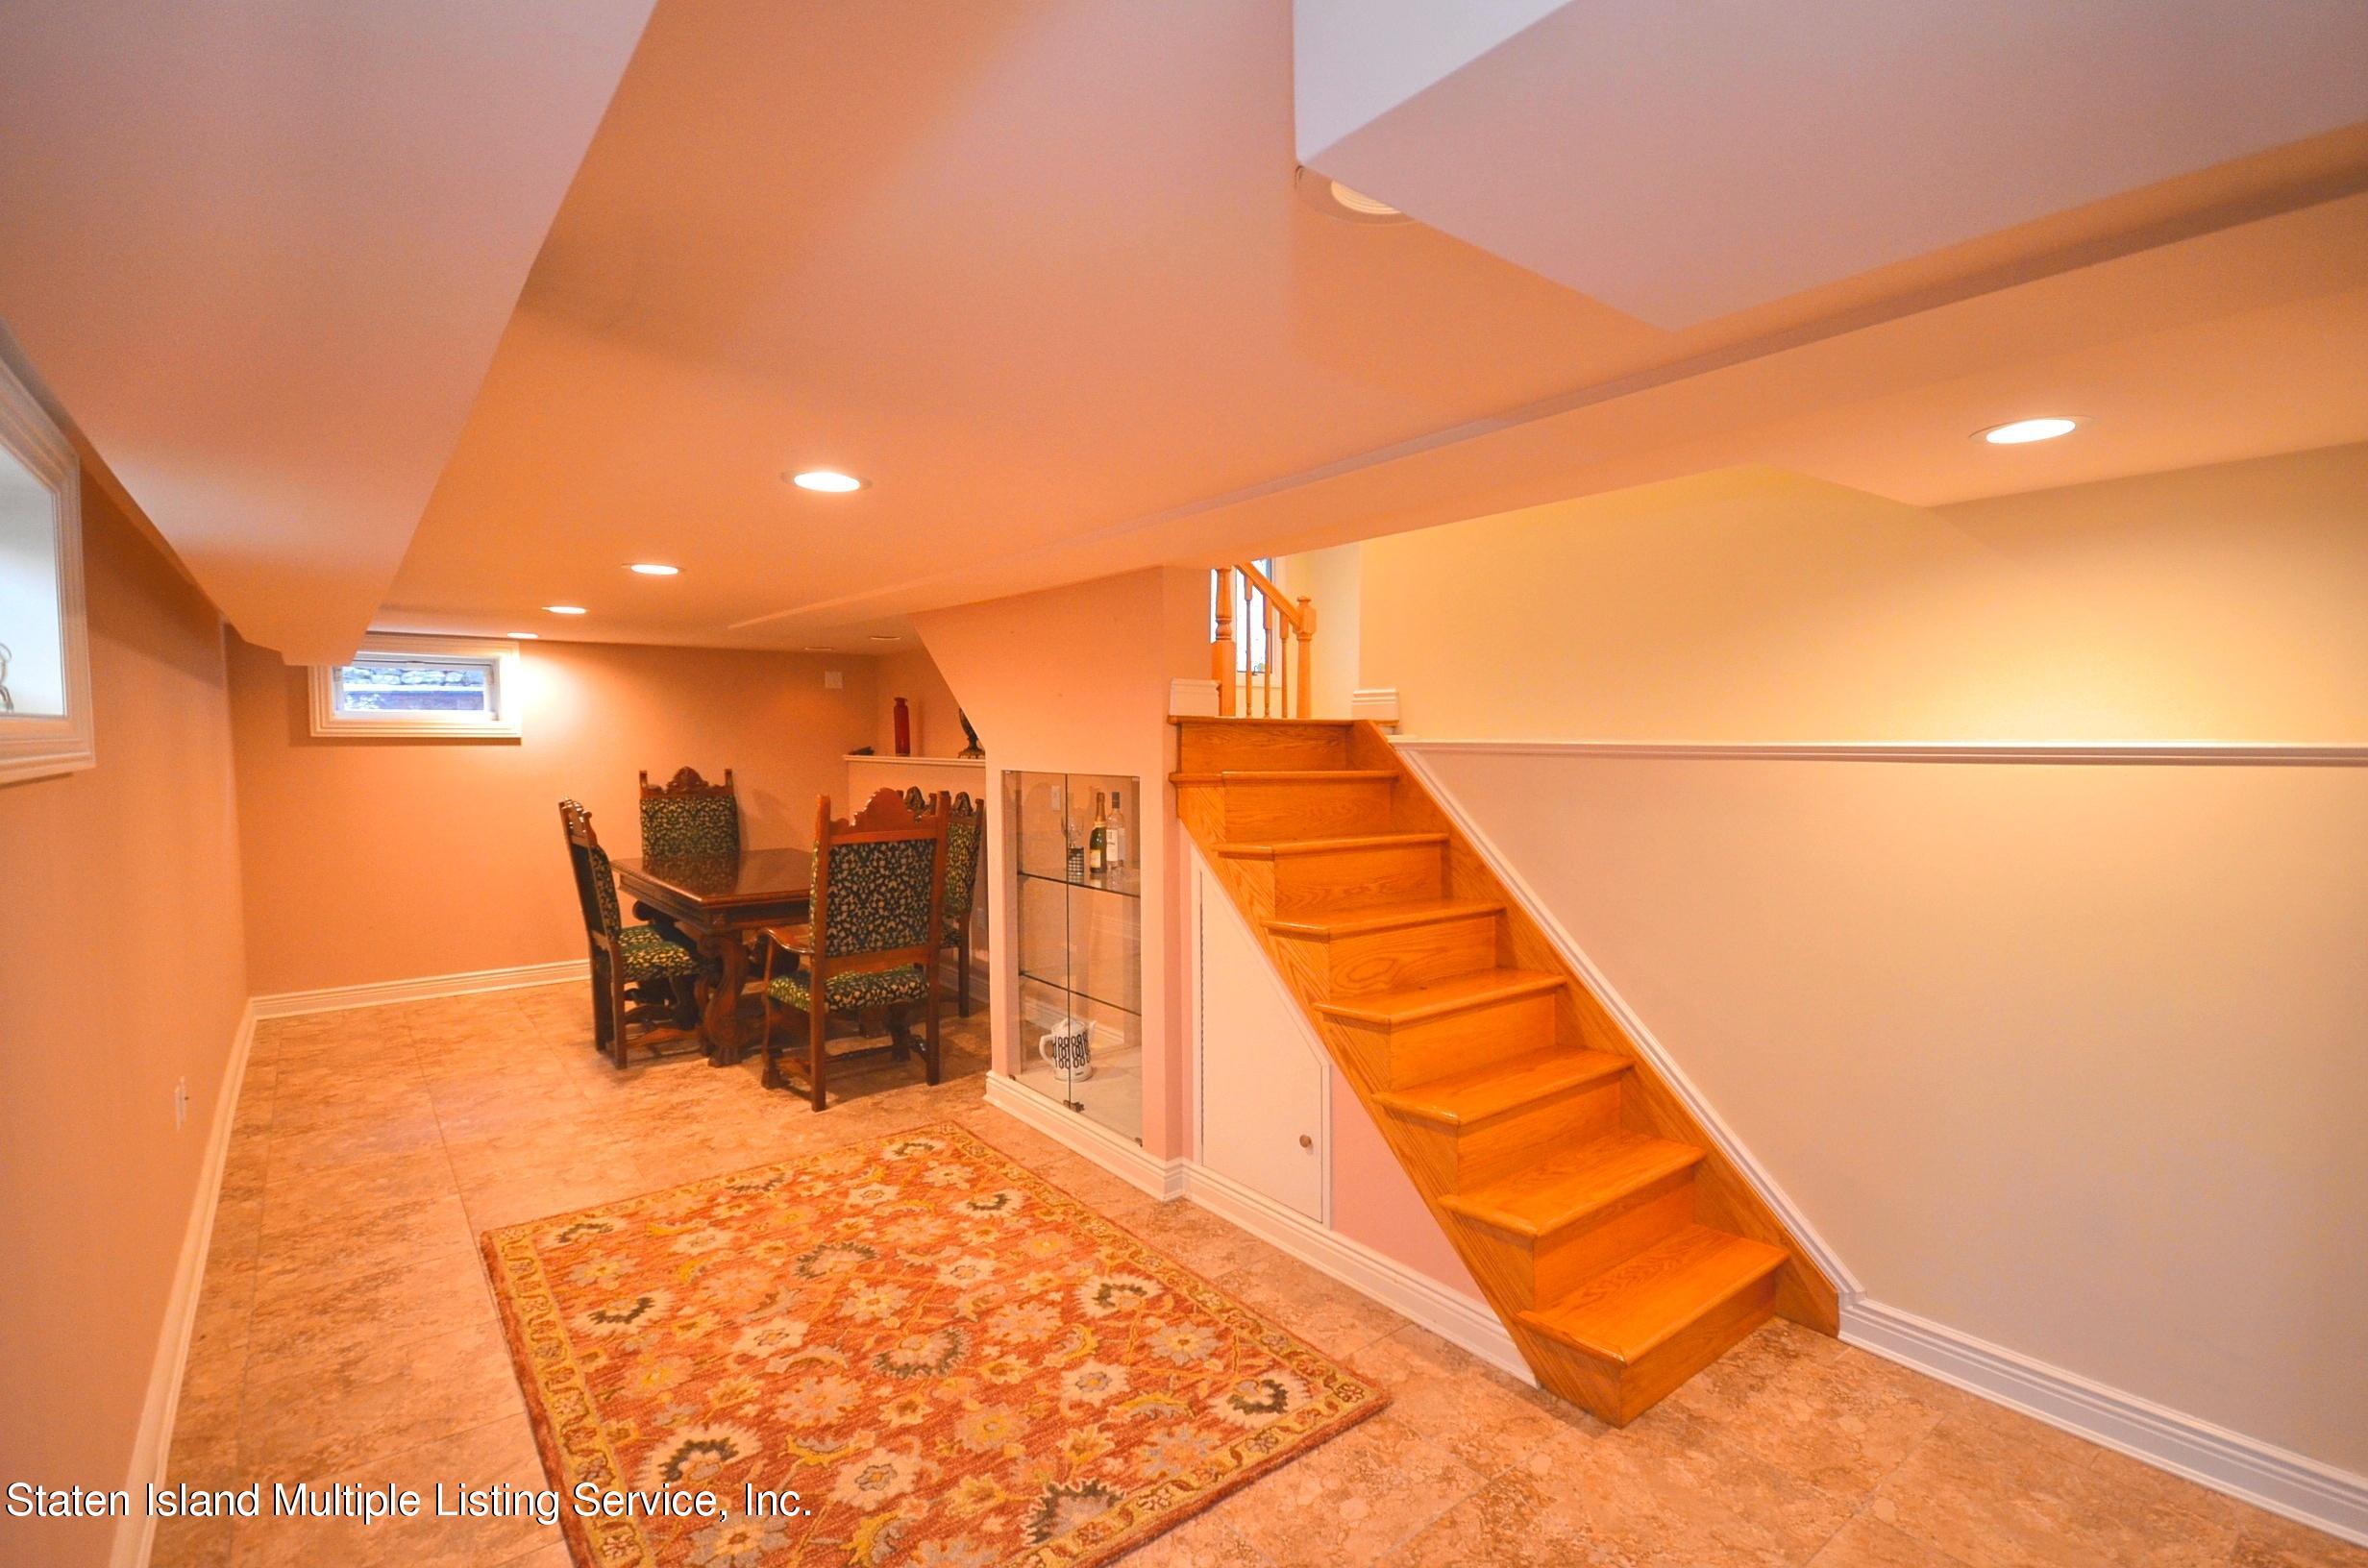 Single Family - Detached 48 Ocean Terrace  Staten Island, NY 10314, MLS-1142240-30